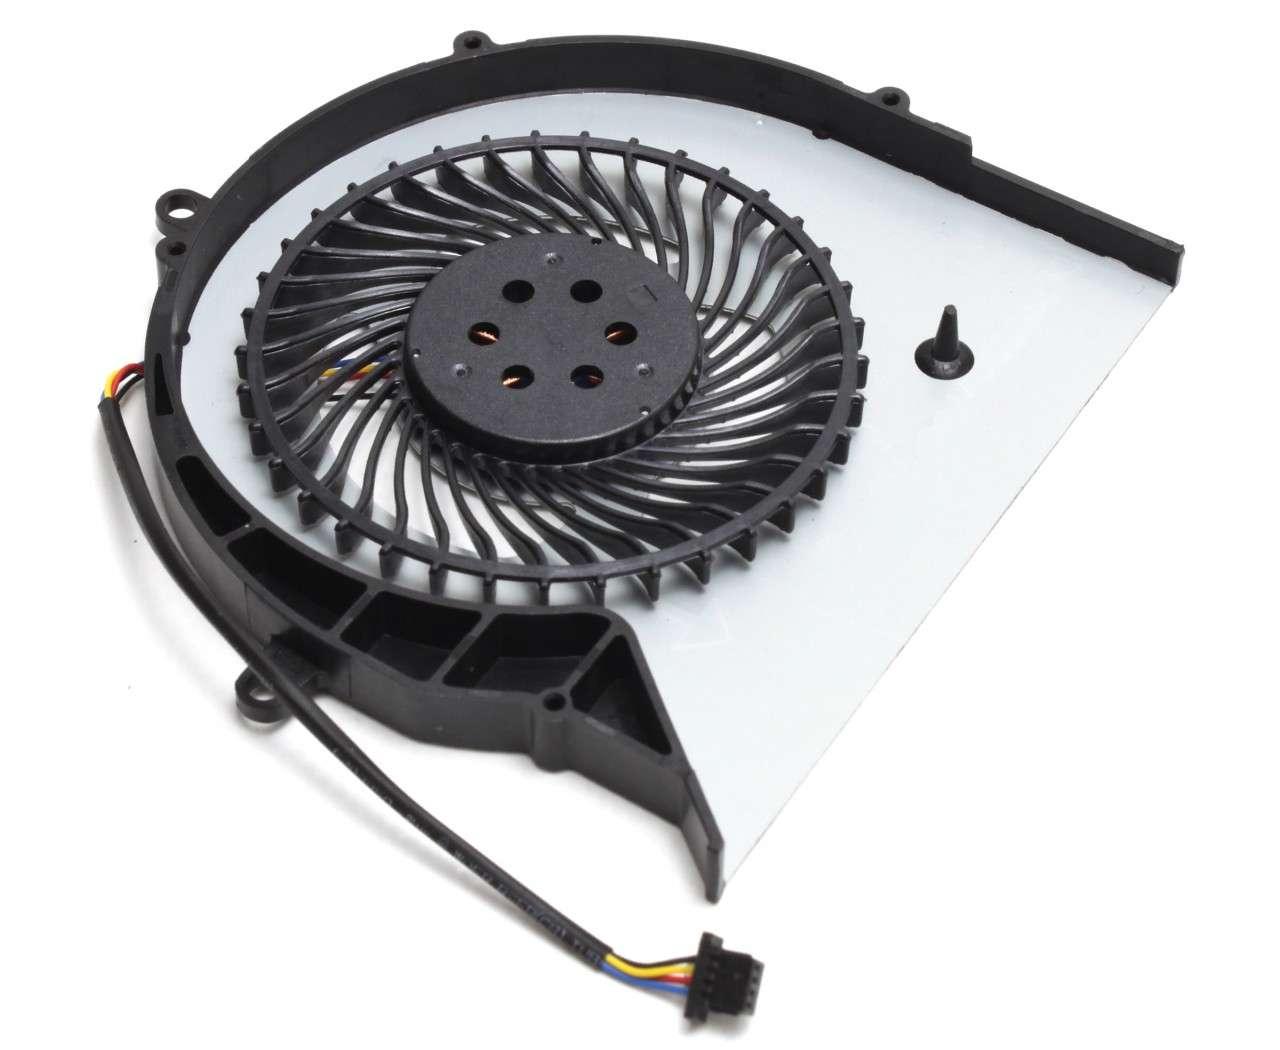 Cooler procesor CPU laptop Asus FX503V imagine powerlaptop.ro 2021